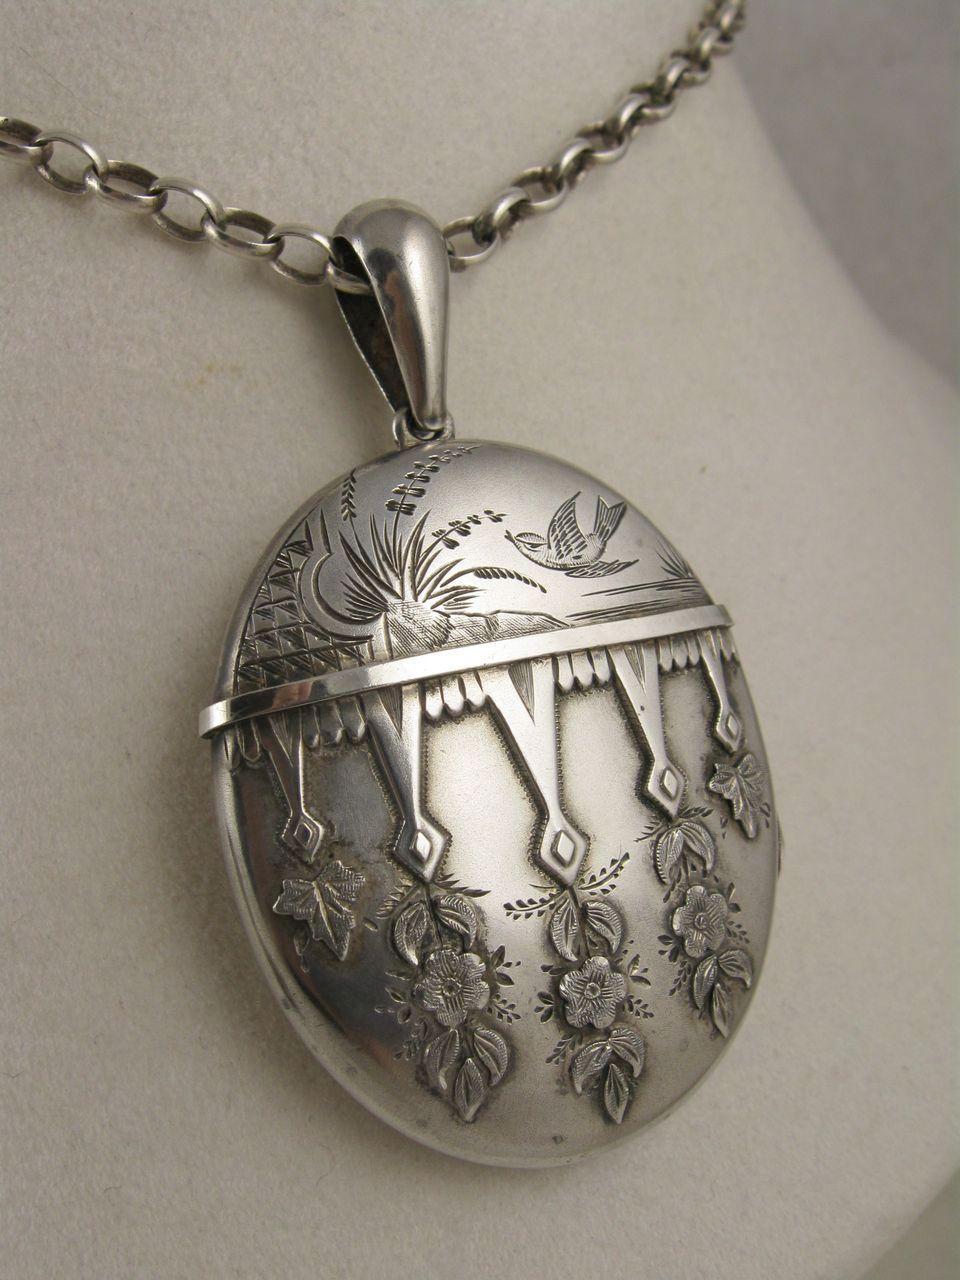 Superb Orig Antique 19thc Aesthetic Movement Silver Brooch-secret Compartment Antiques